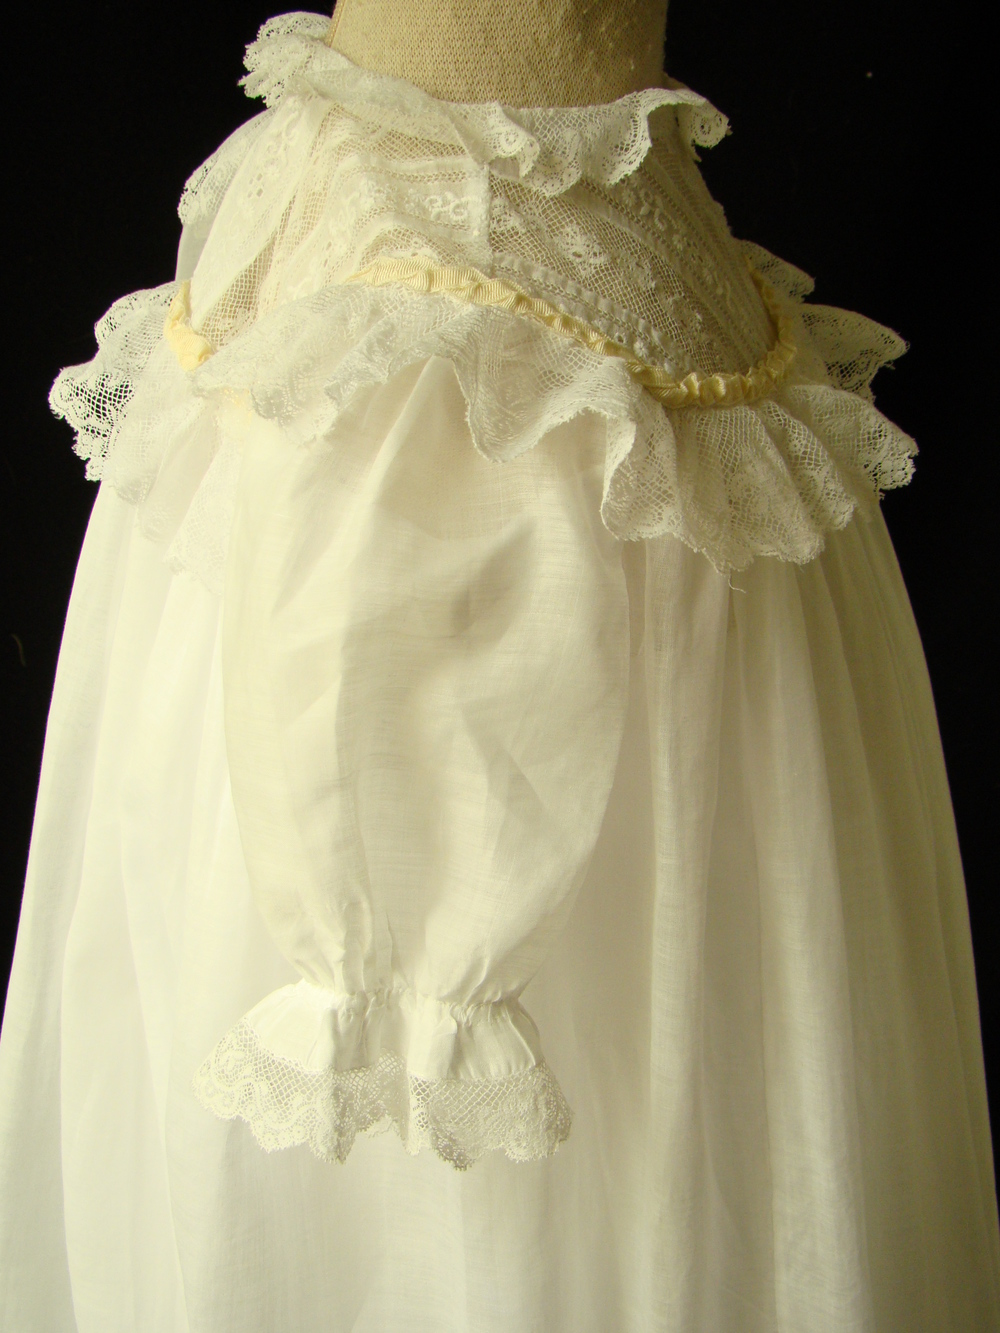 gowns3 045.JPG